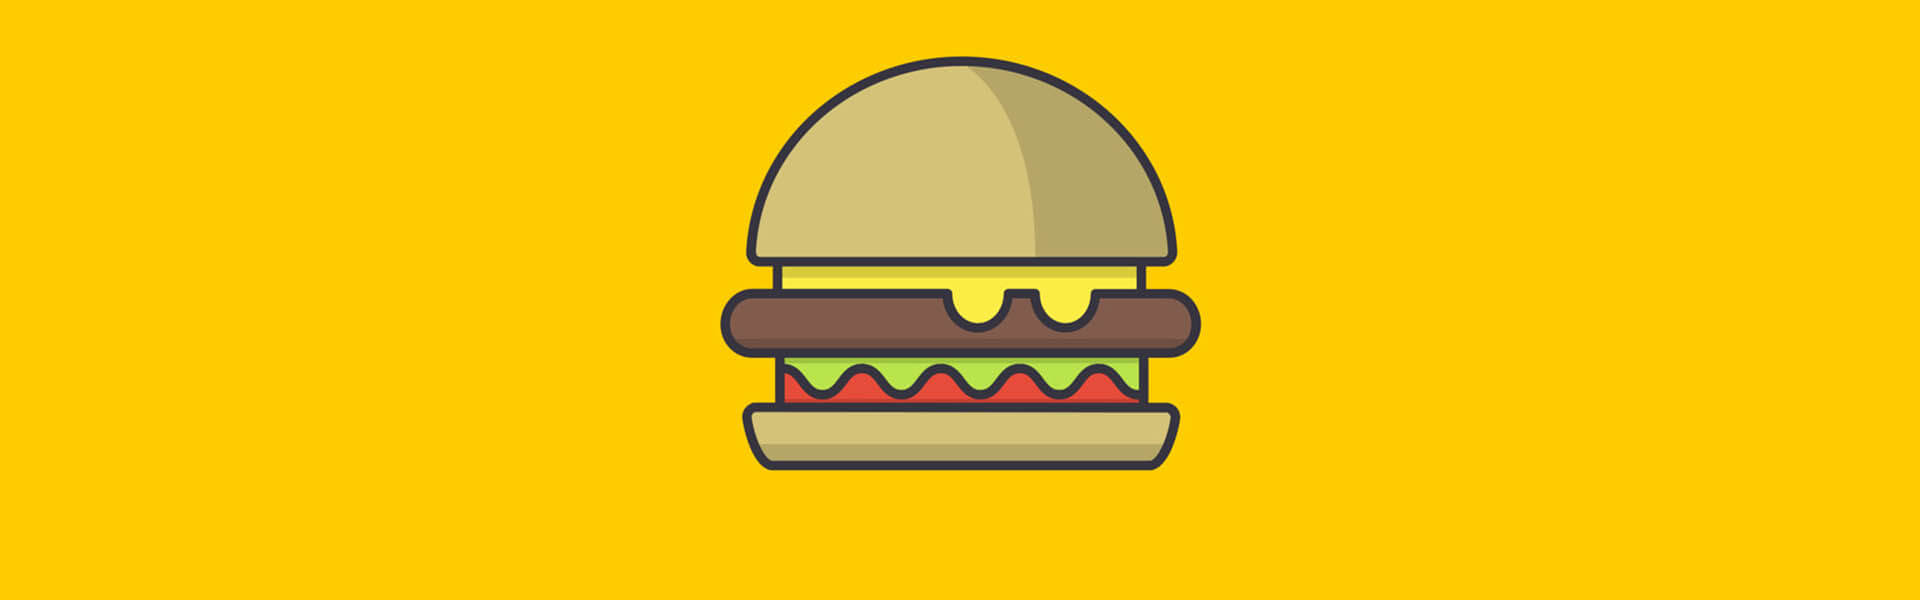 Hamburger Menus για desktop sites; Μα καλά που ζούμε;